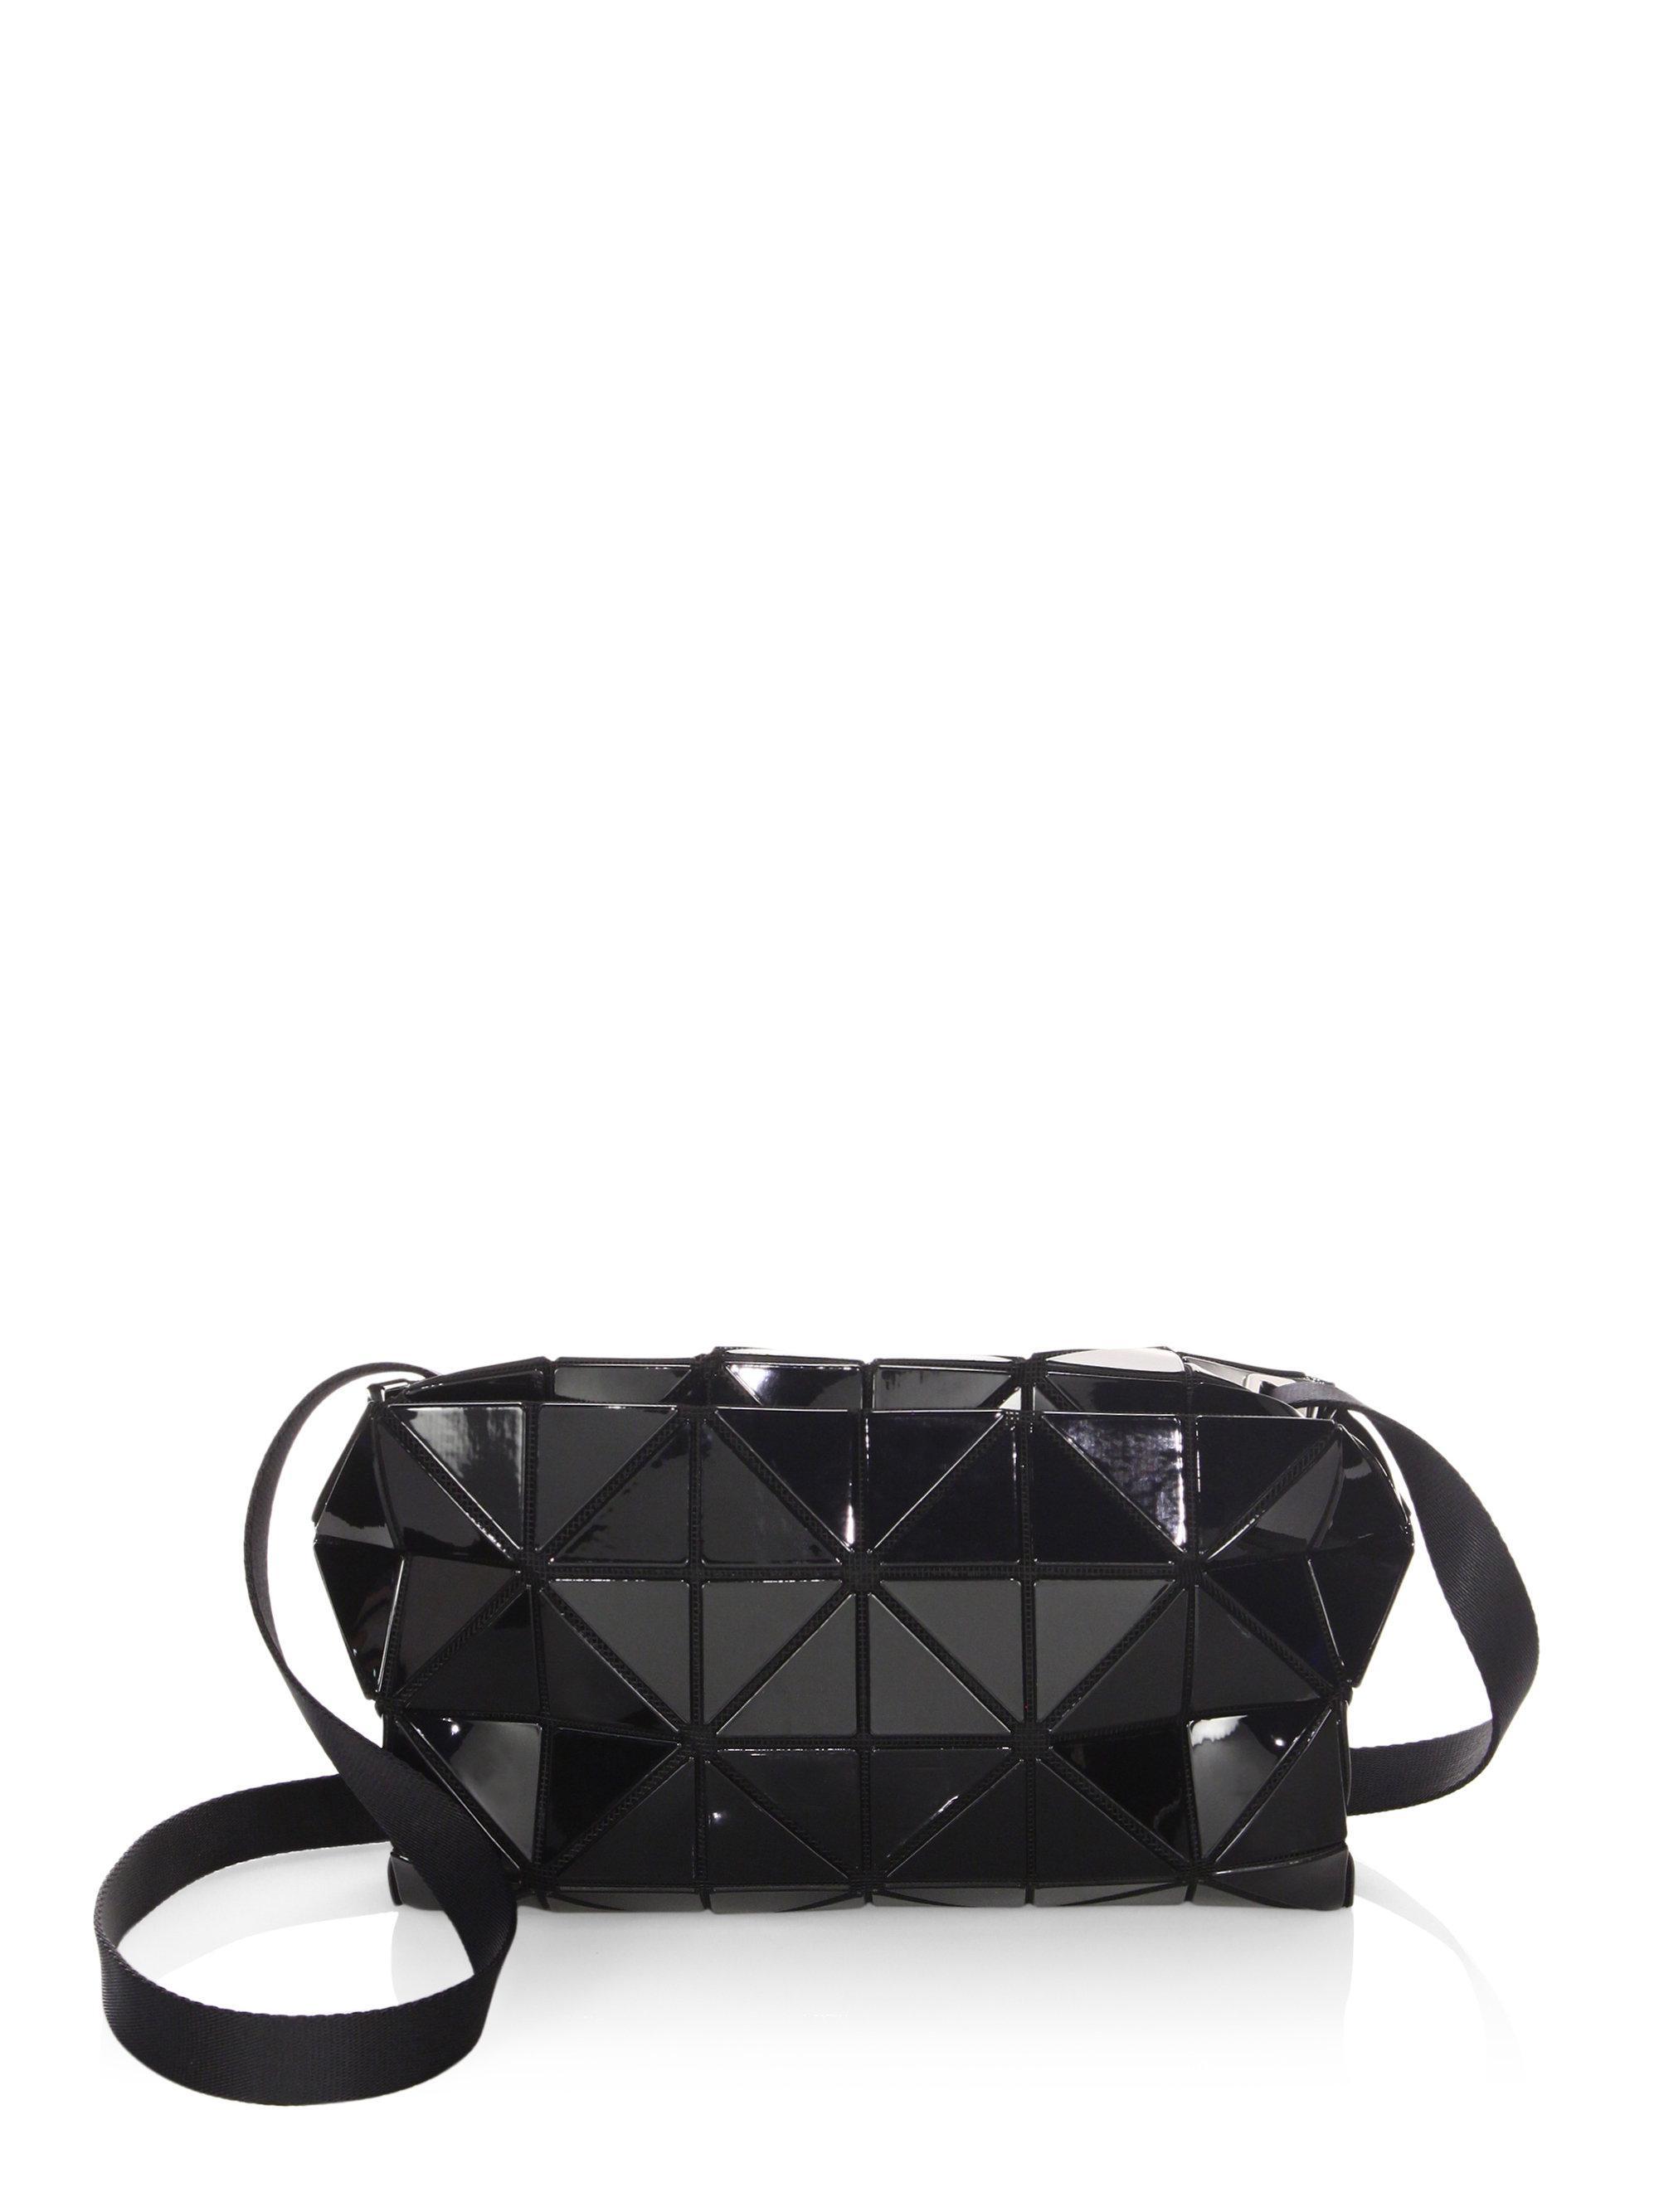 Bao Bao Issey Miyake Women s Carton Crossbody Bag - Black in Black ... 5f73b1178dd60